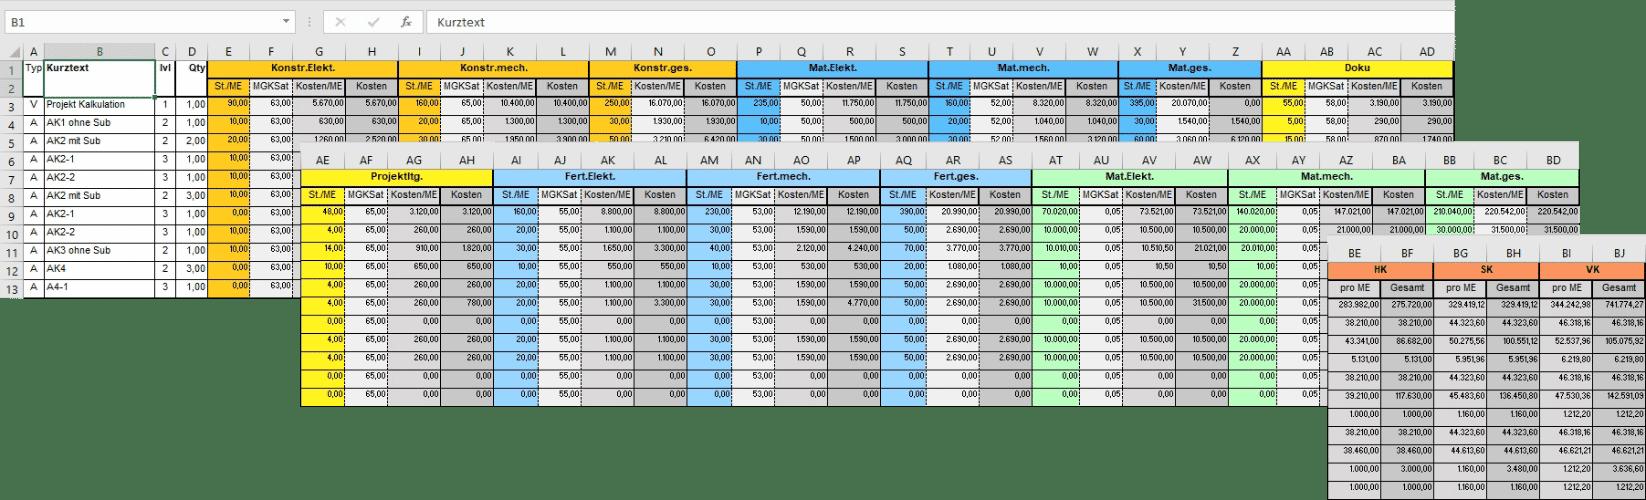 CPQ Excel Costbook Exports Grafik 2